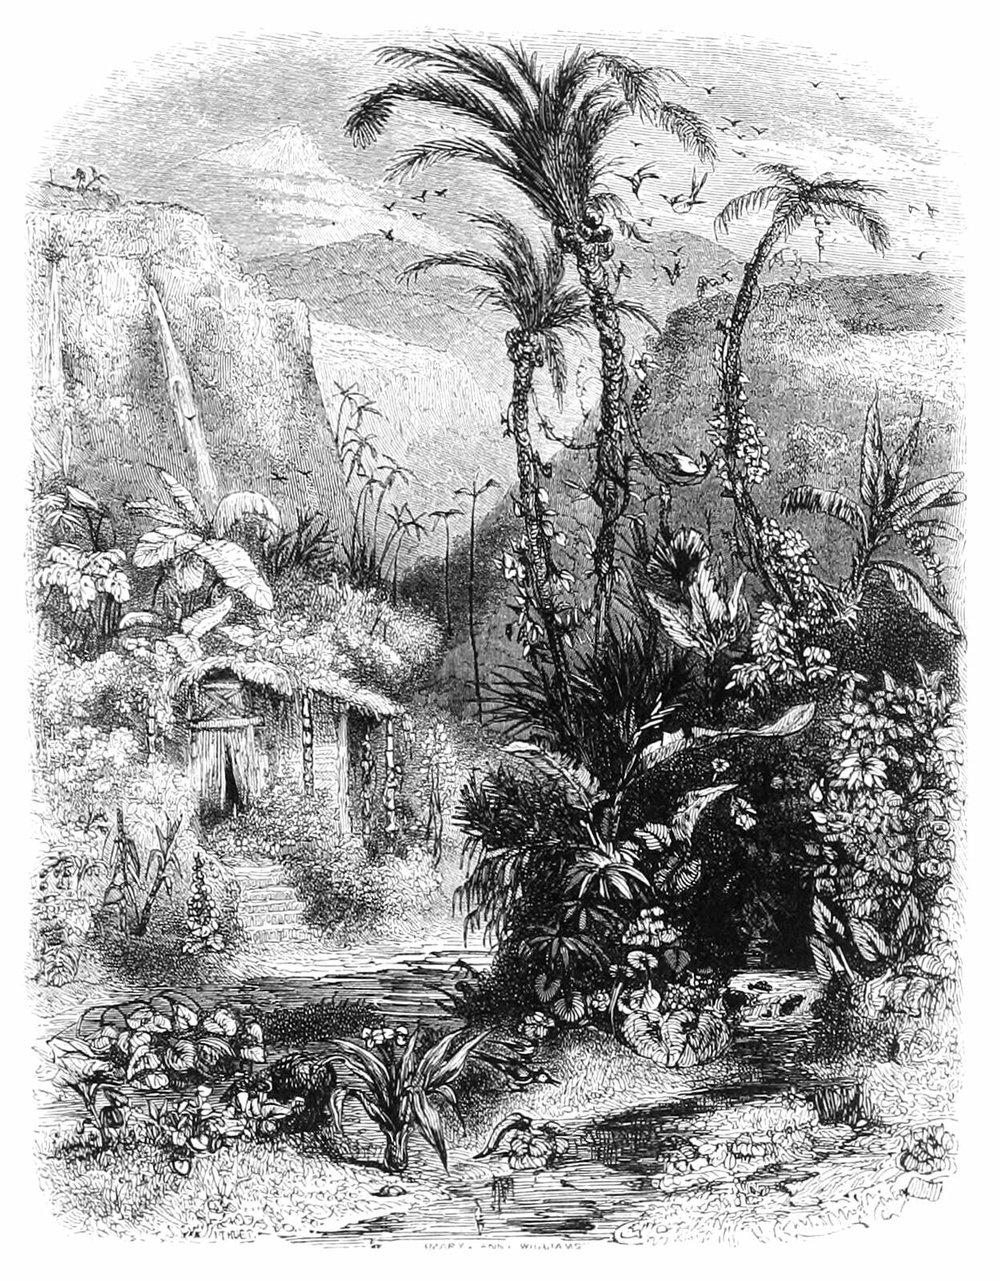 Wood Engraving by Mary Ann Williams of 'The Pariah's Garden at Dawn', by Paul Huet from the book  Paul et Virginie by Jacques-Henri Bernardin de Saint-Pierre, 1838